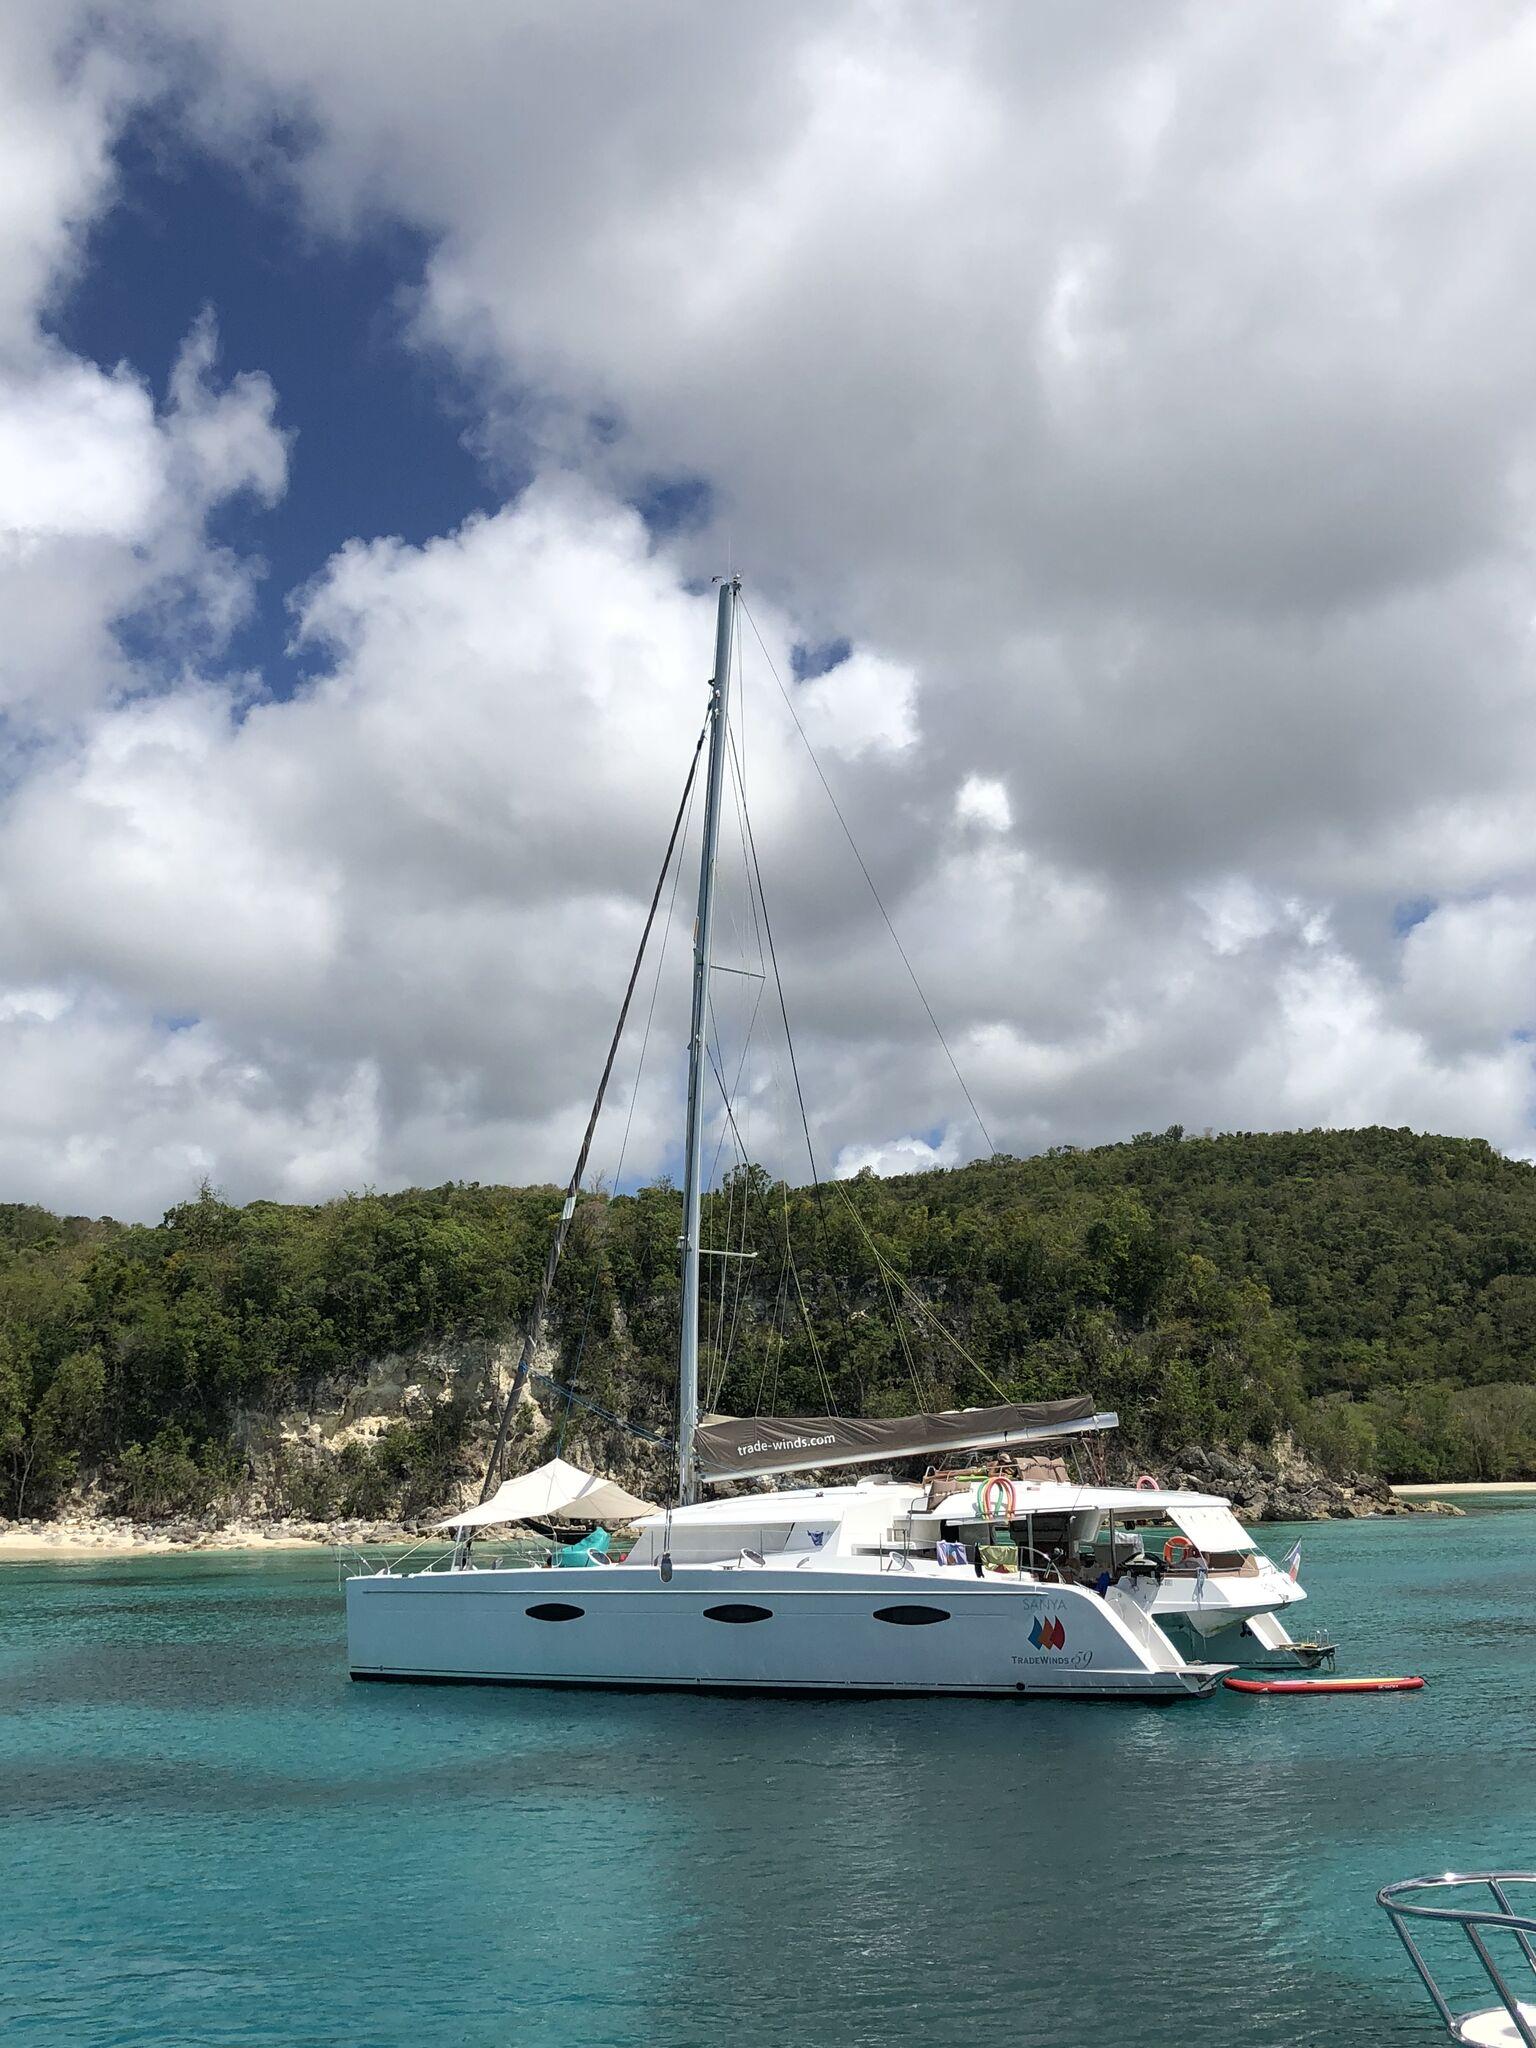 PaleOMG - Celebrating My 30th Birthday at Sea with TradeWinds